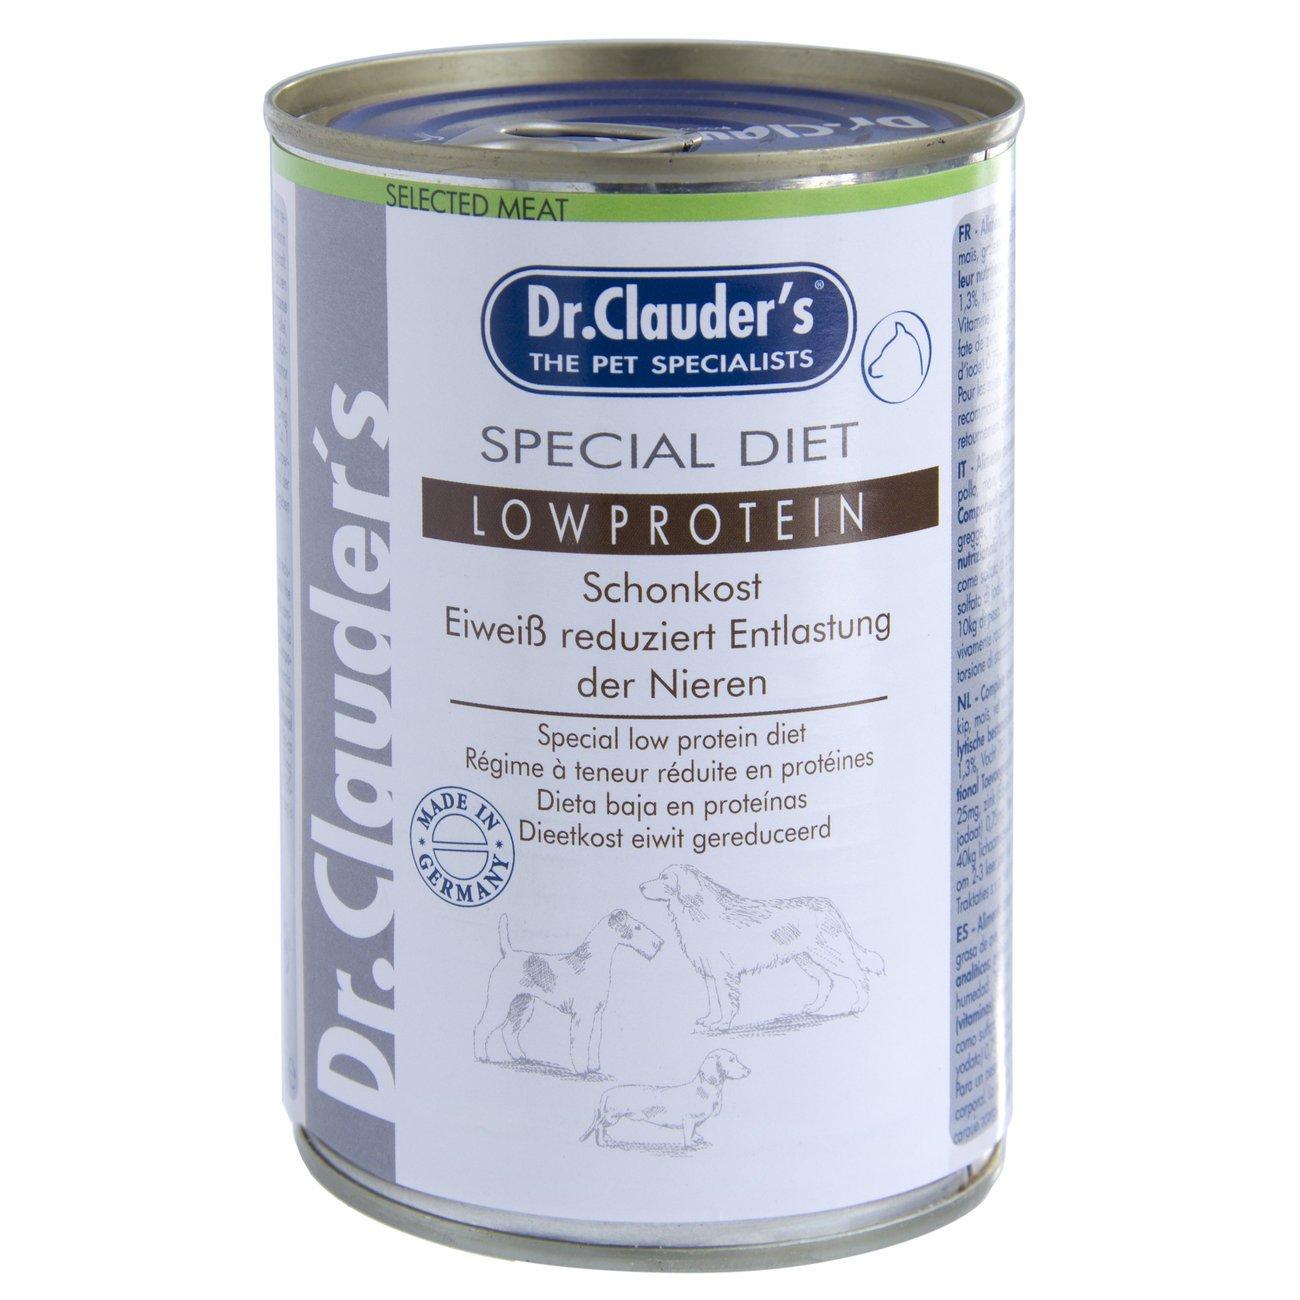 Dr. Clauders Special Diet Diät Schonkost Hundefutter, Bild 5